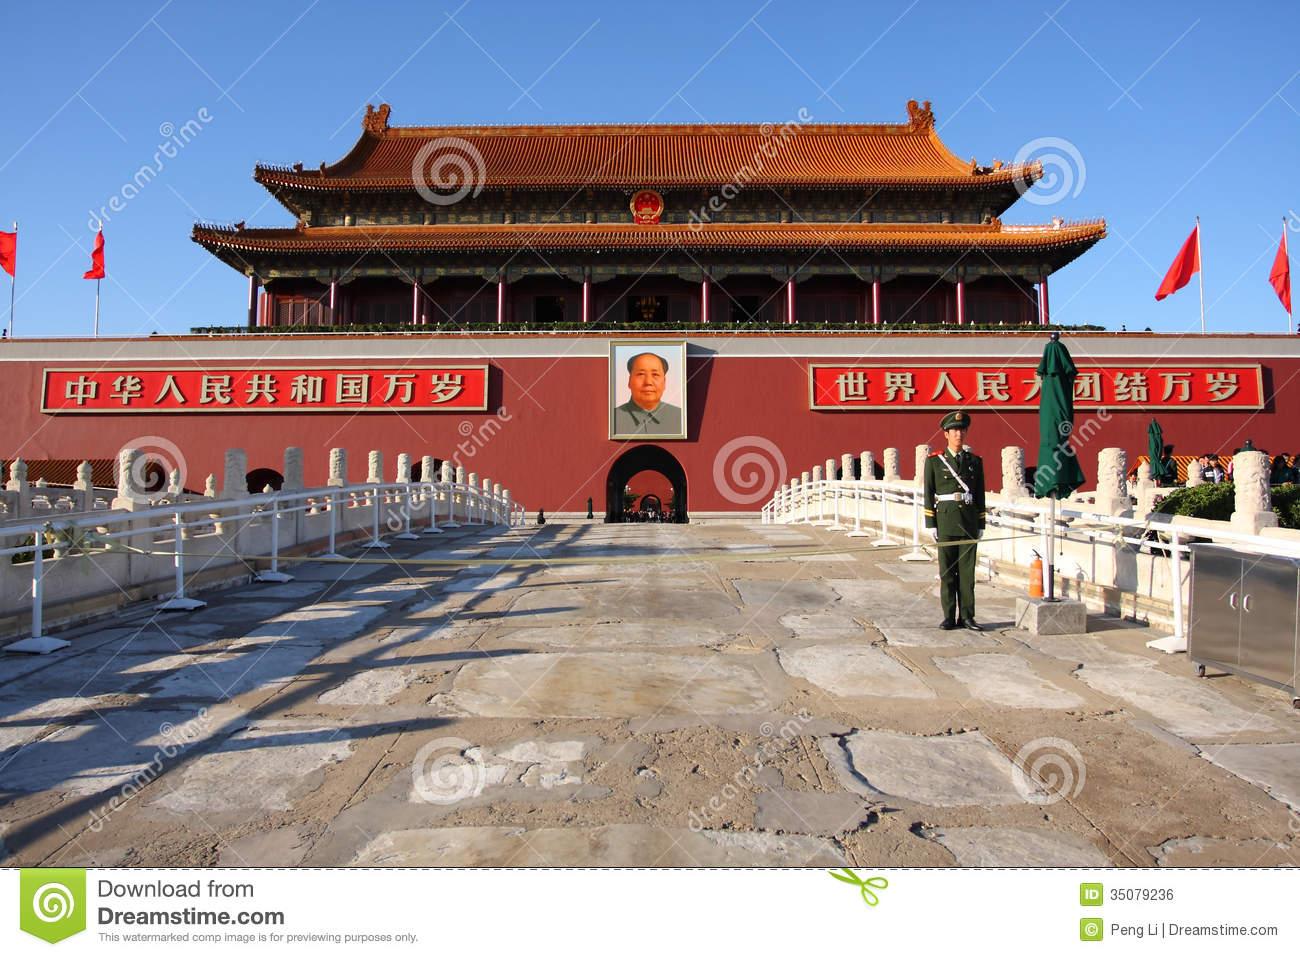 The Tiananmen Square Editorial Image.